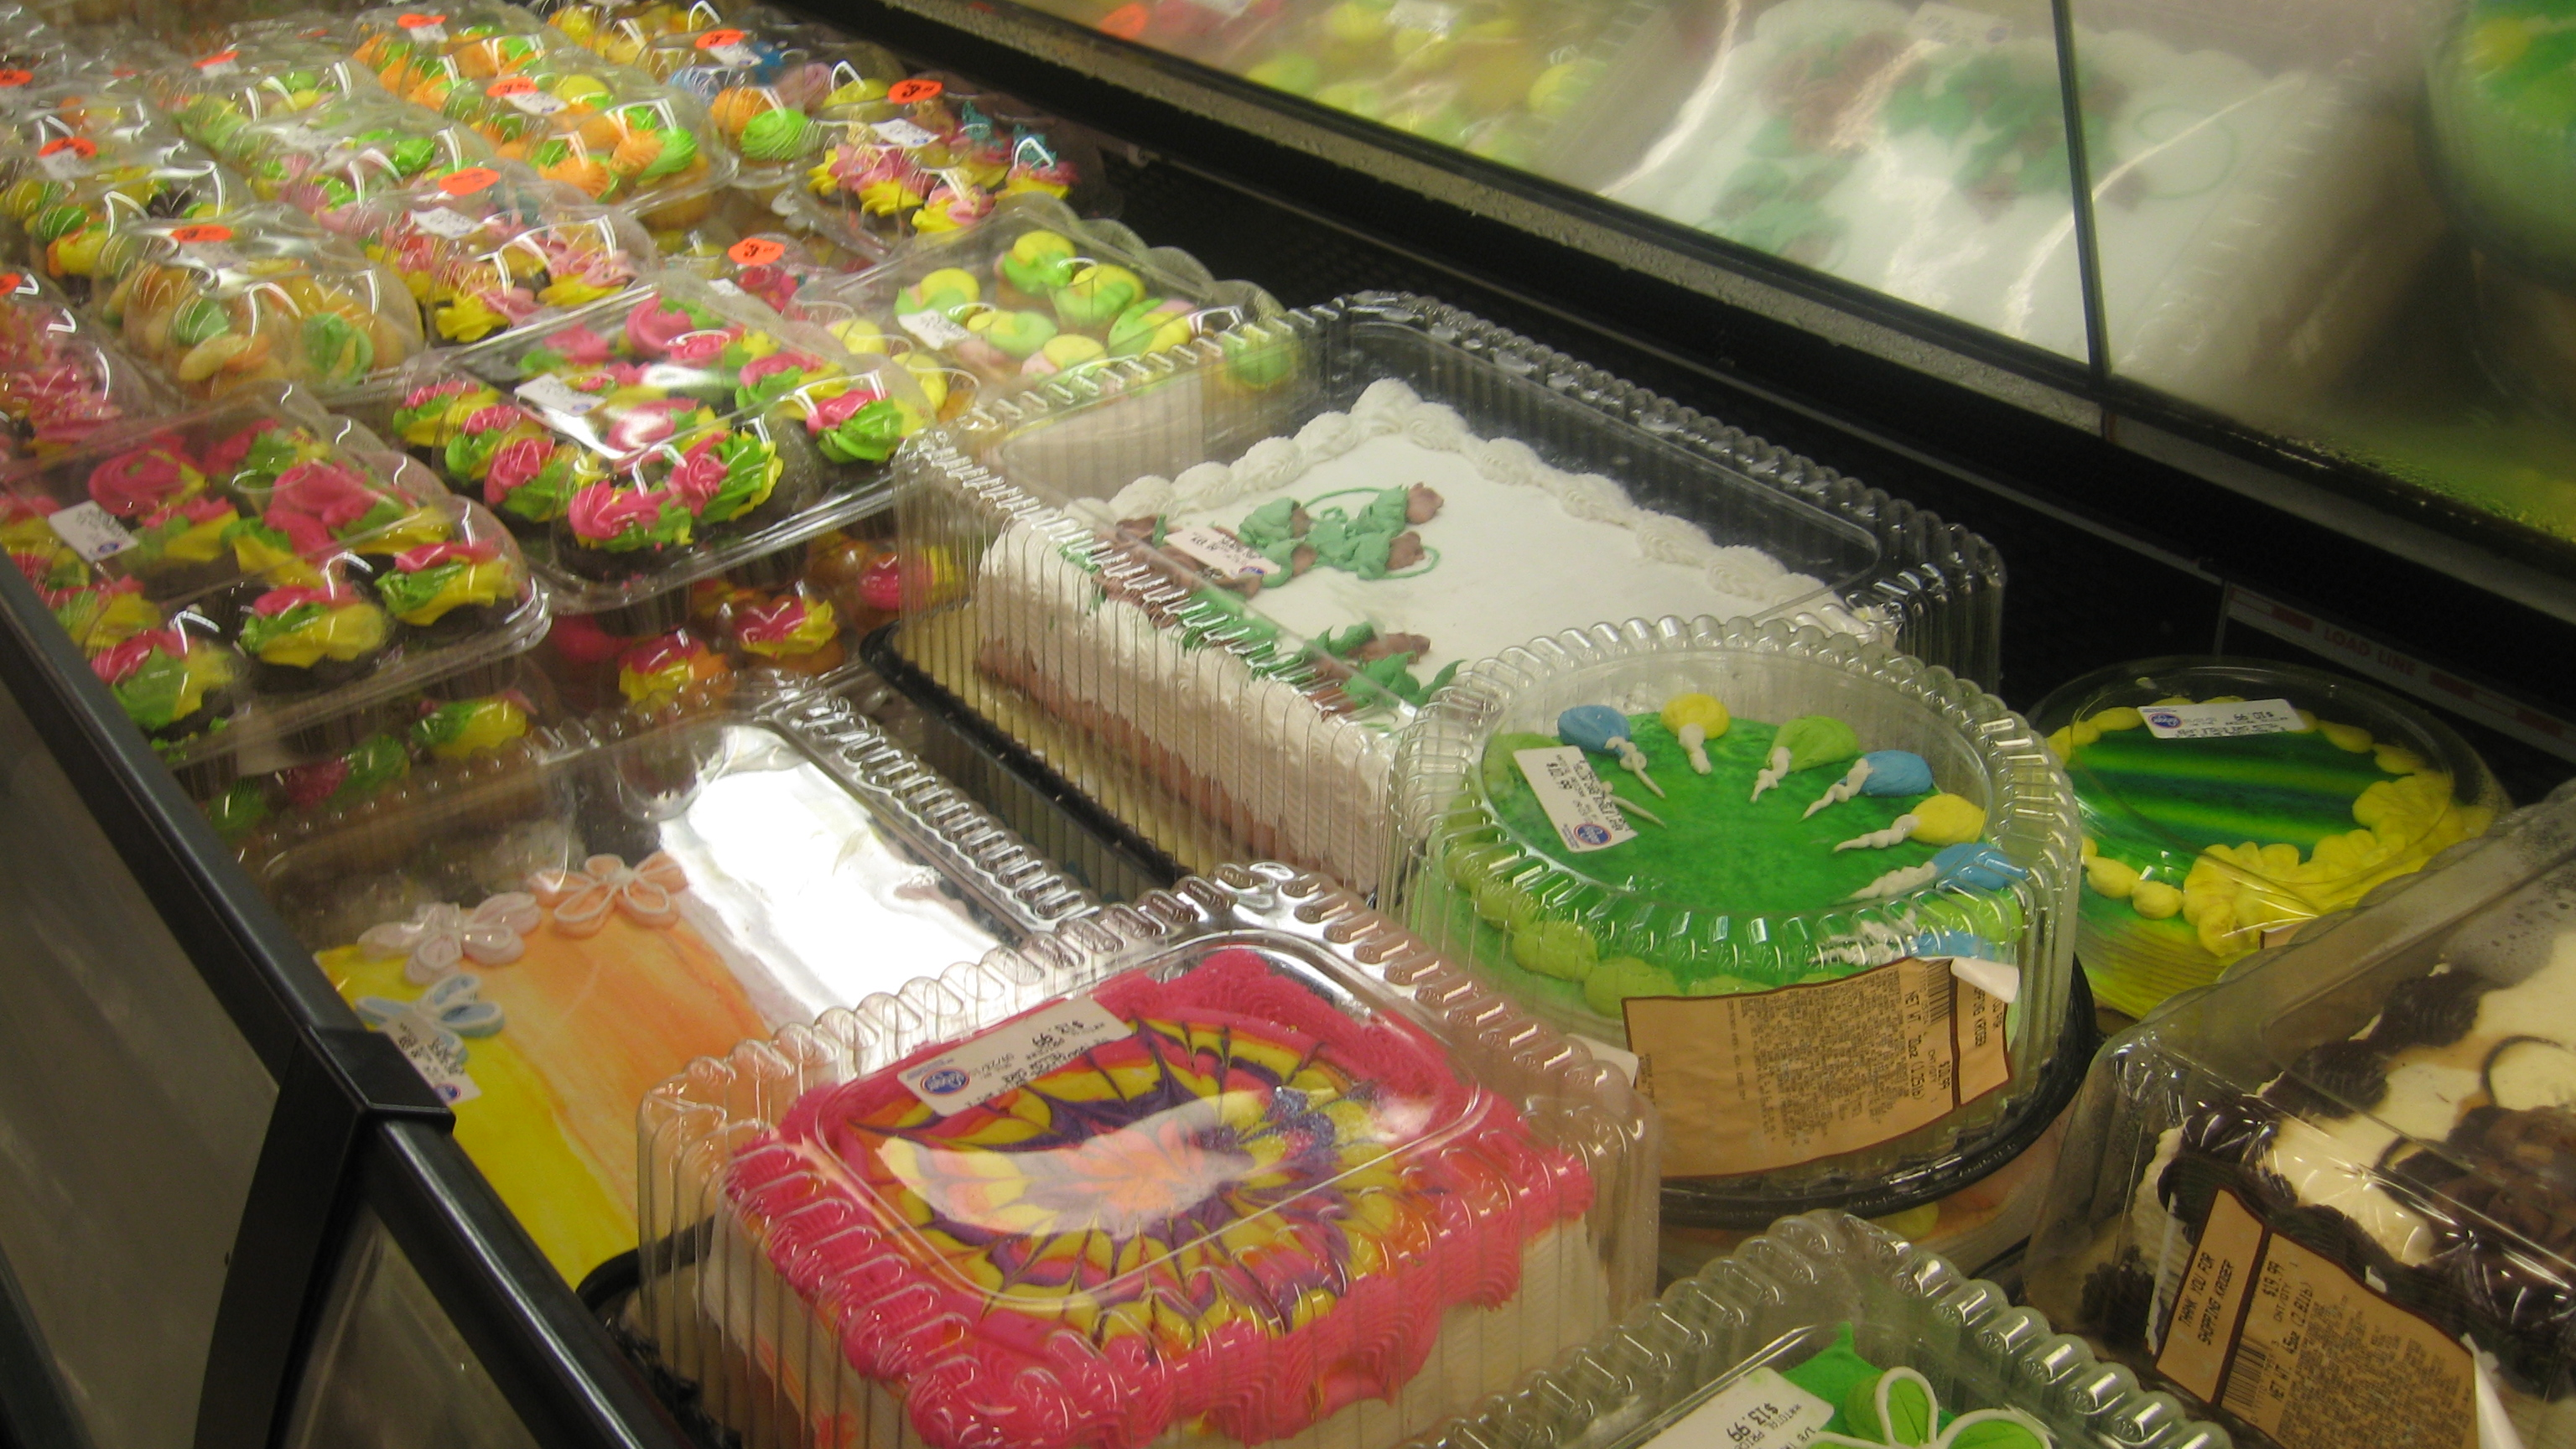 Bakery Birthday Cakes At Kroger